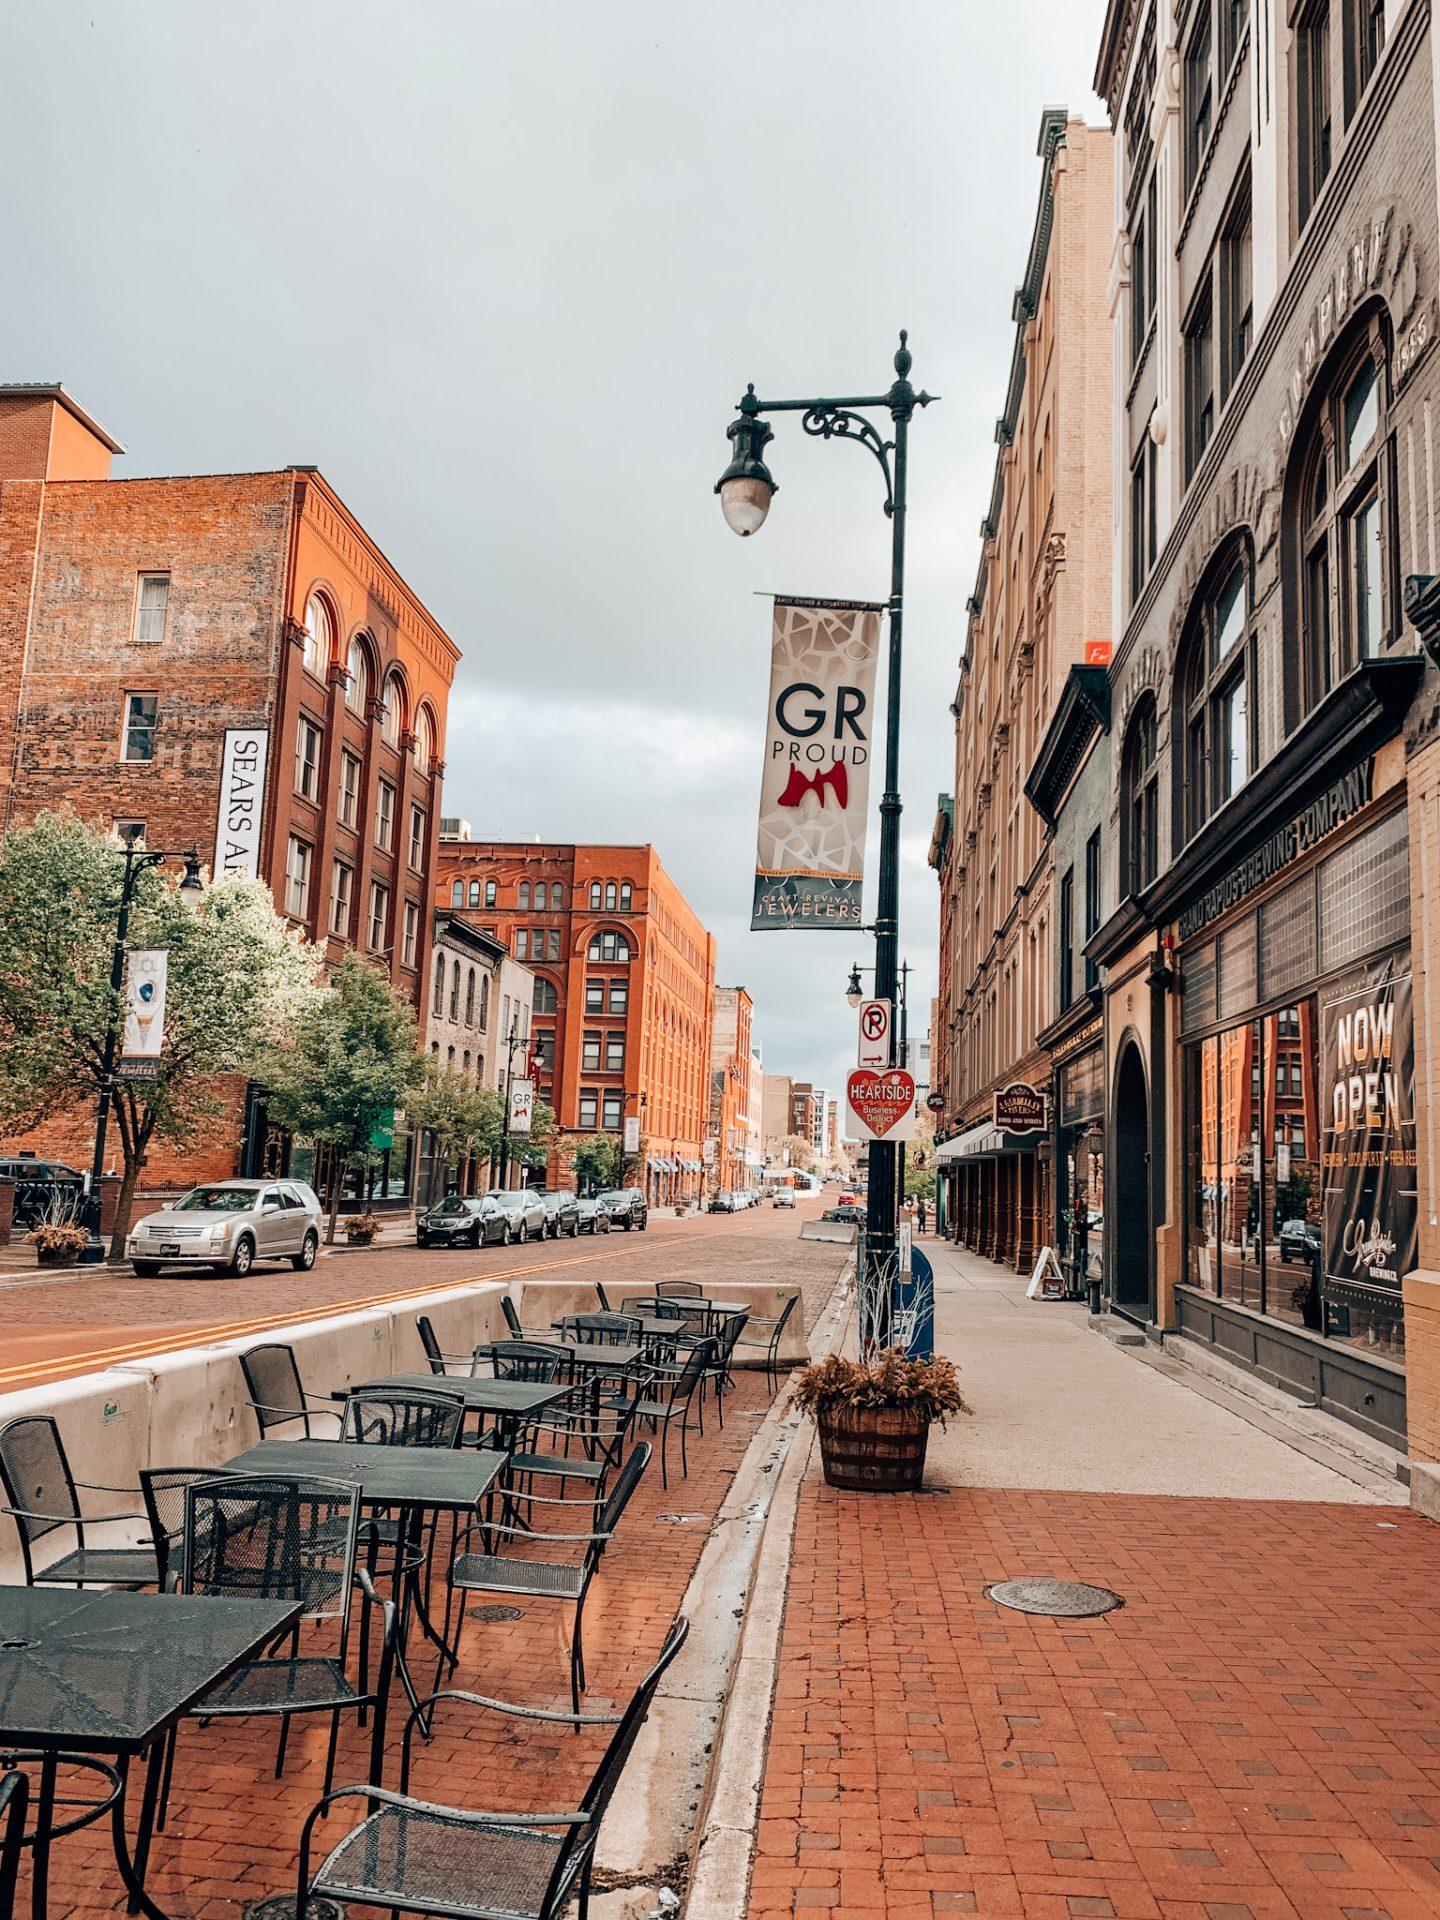 Downtown Grand Rapids, Michigan